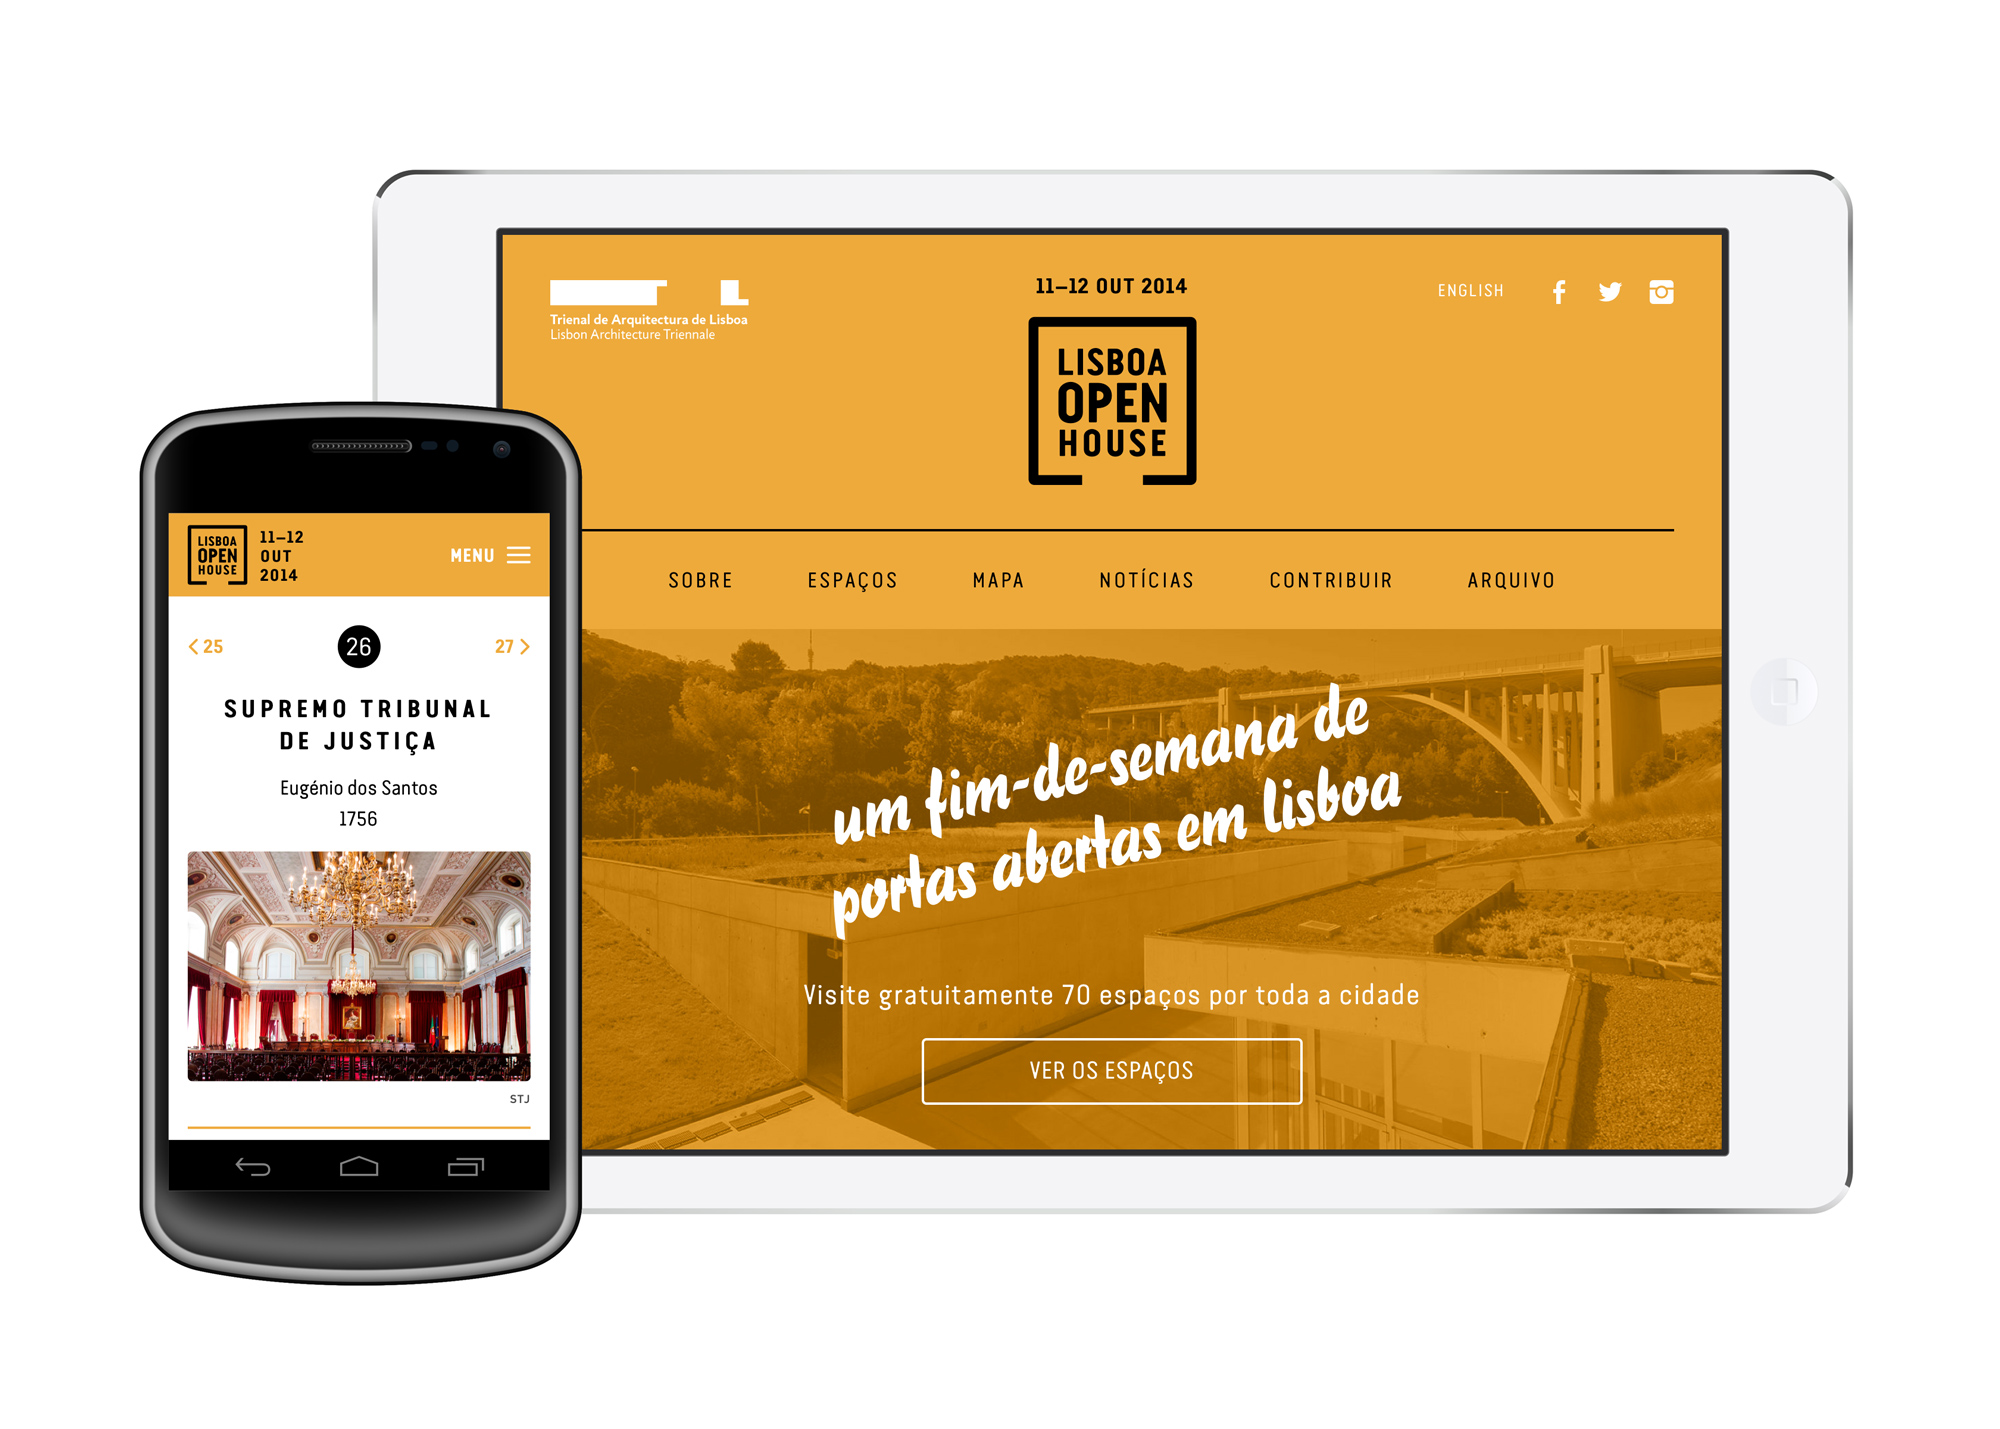 lisbonopenhouse2014_mobile